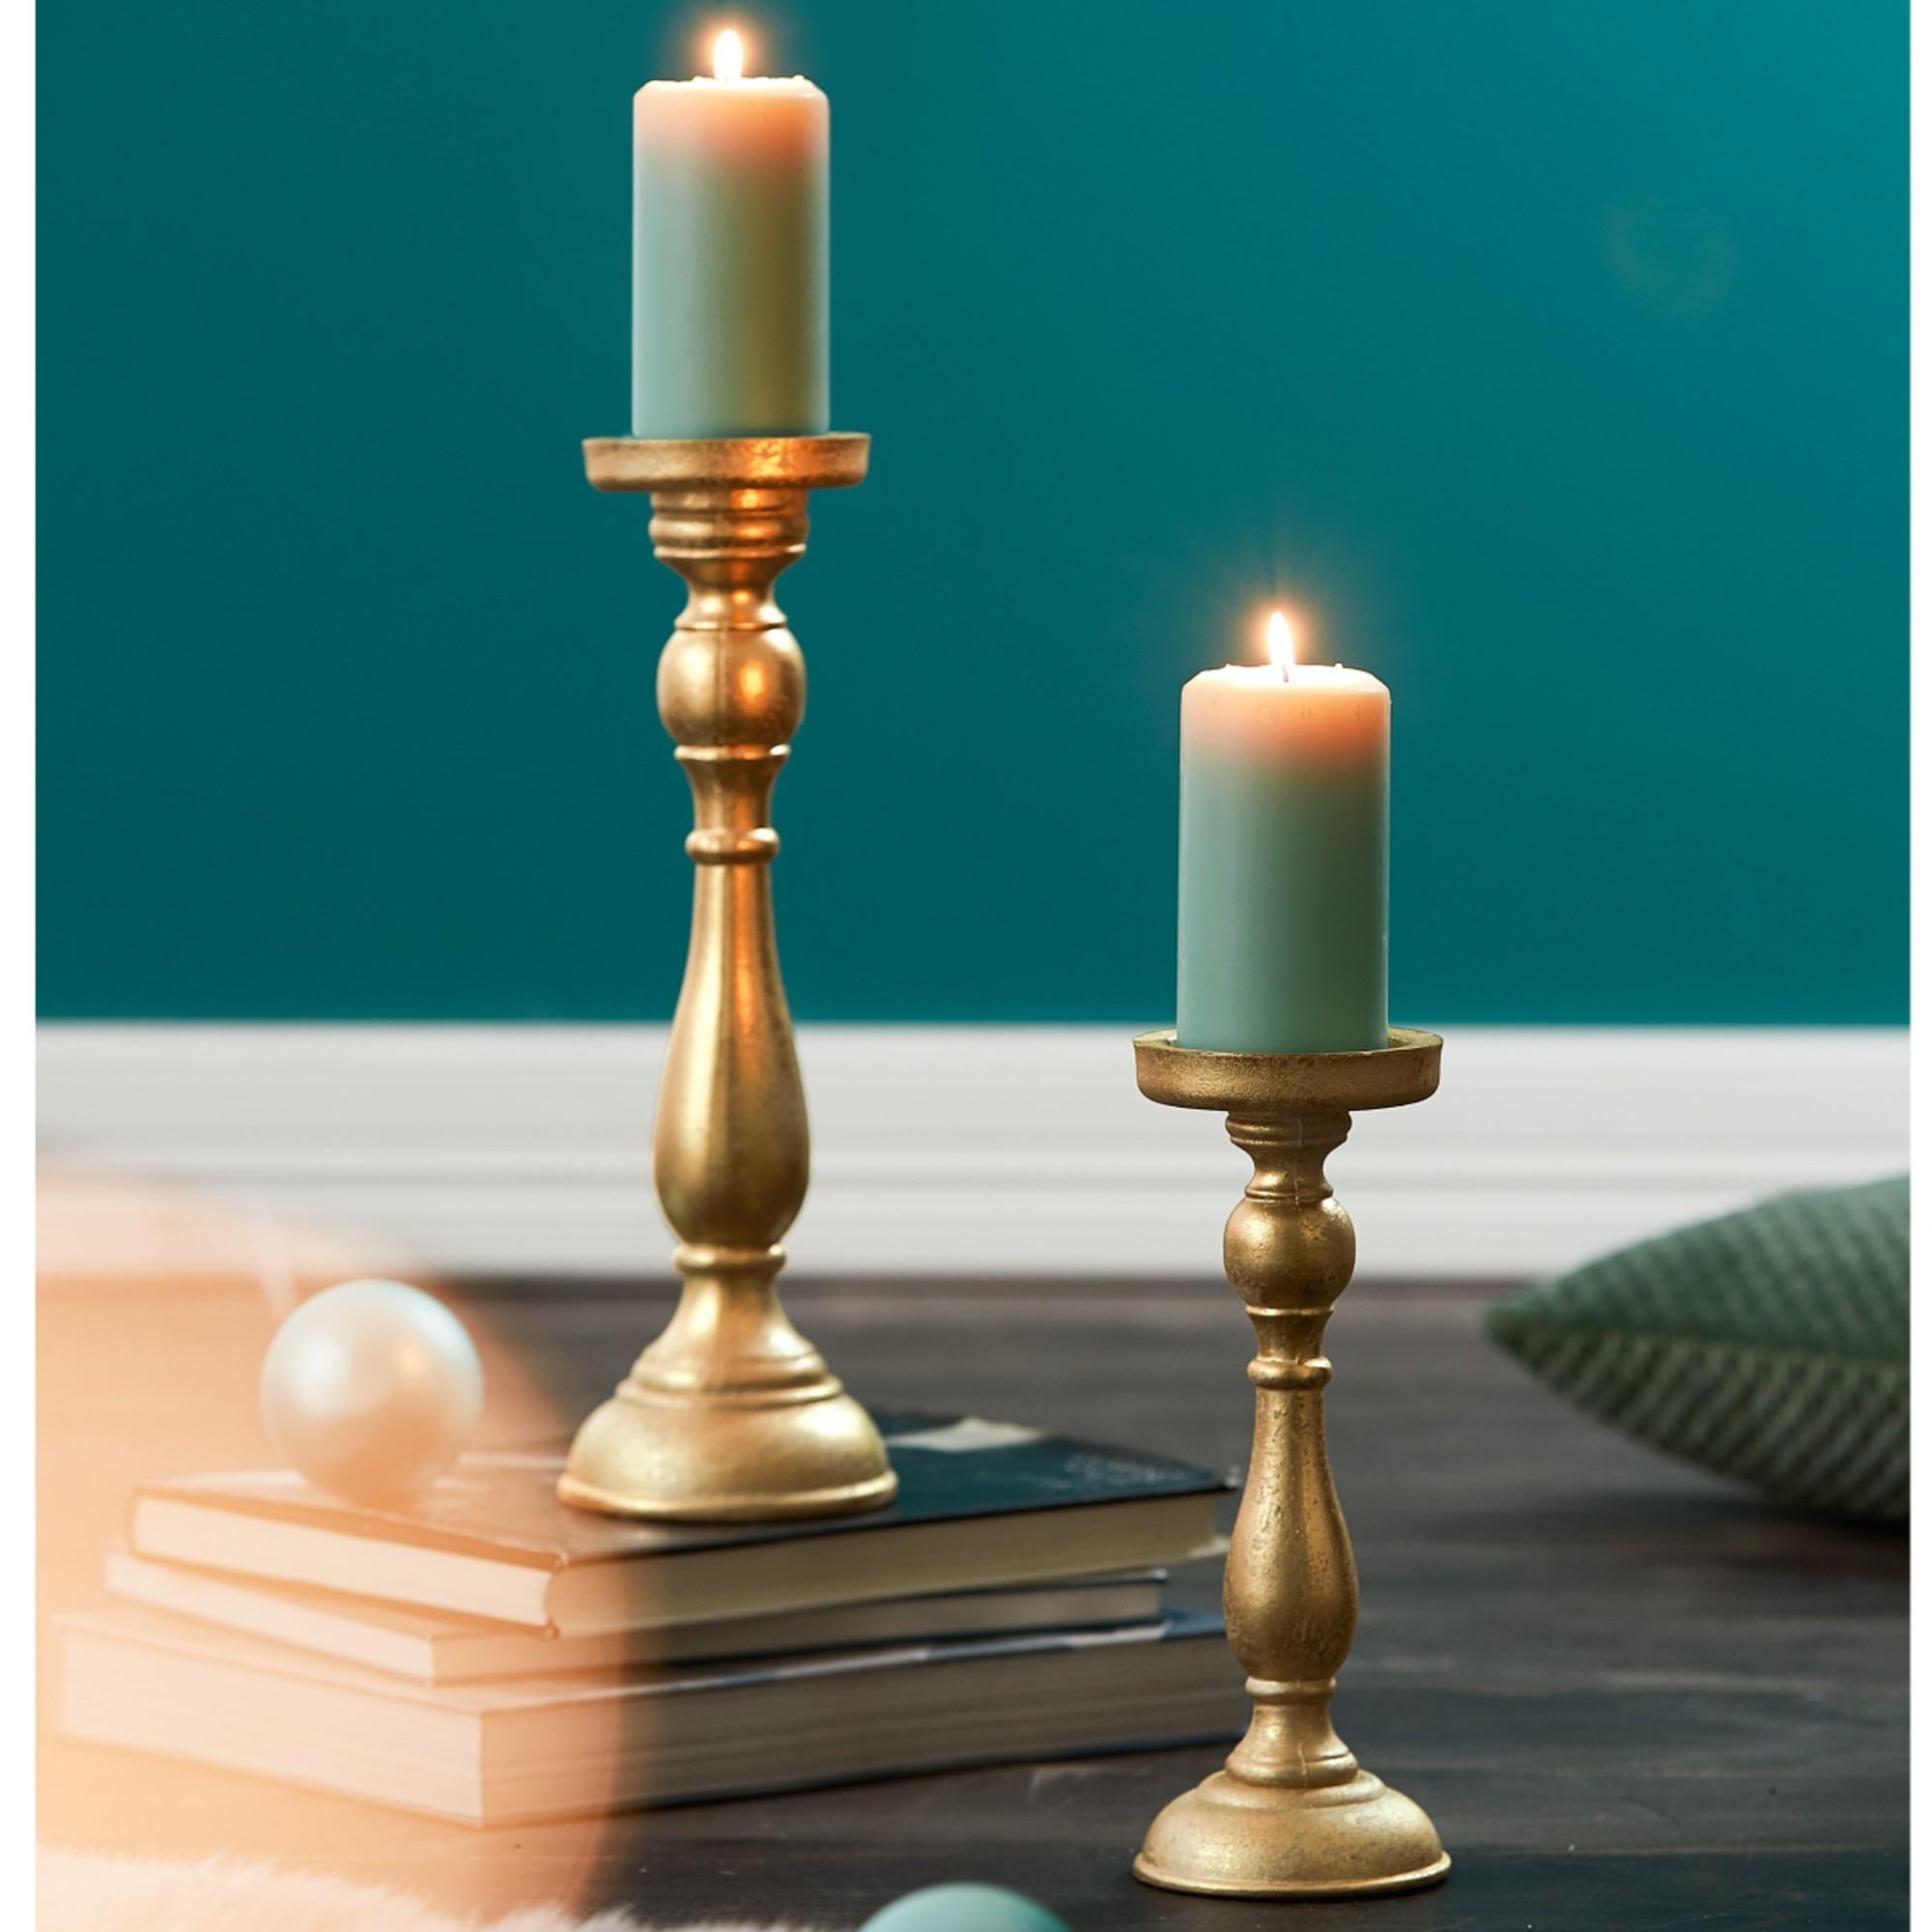 5 x Dekorativer 3-fach Kerzenhalter LÖWE Skulptur goldfarben 52